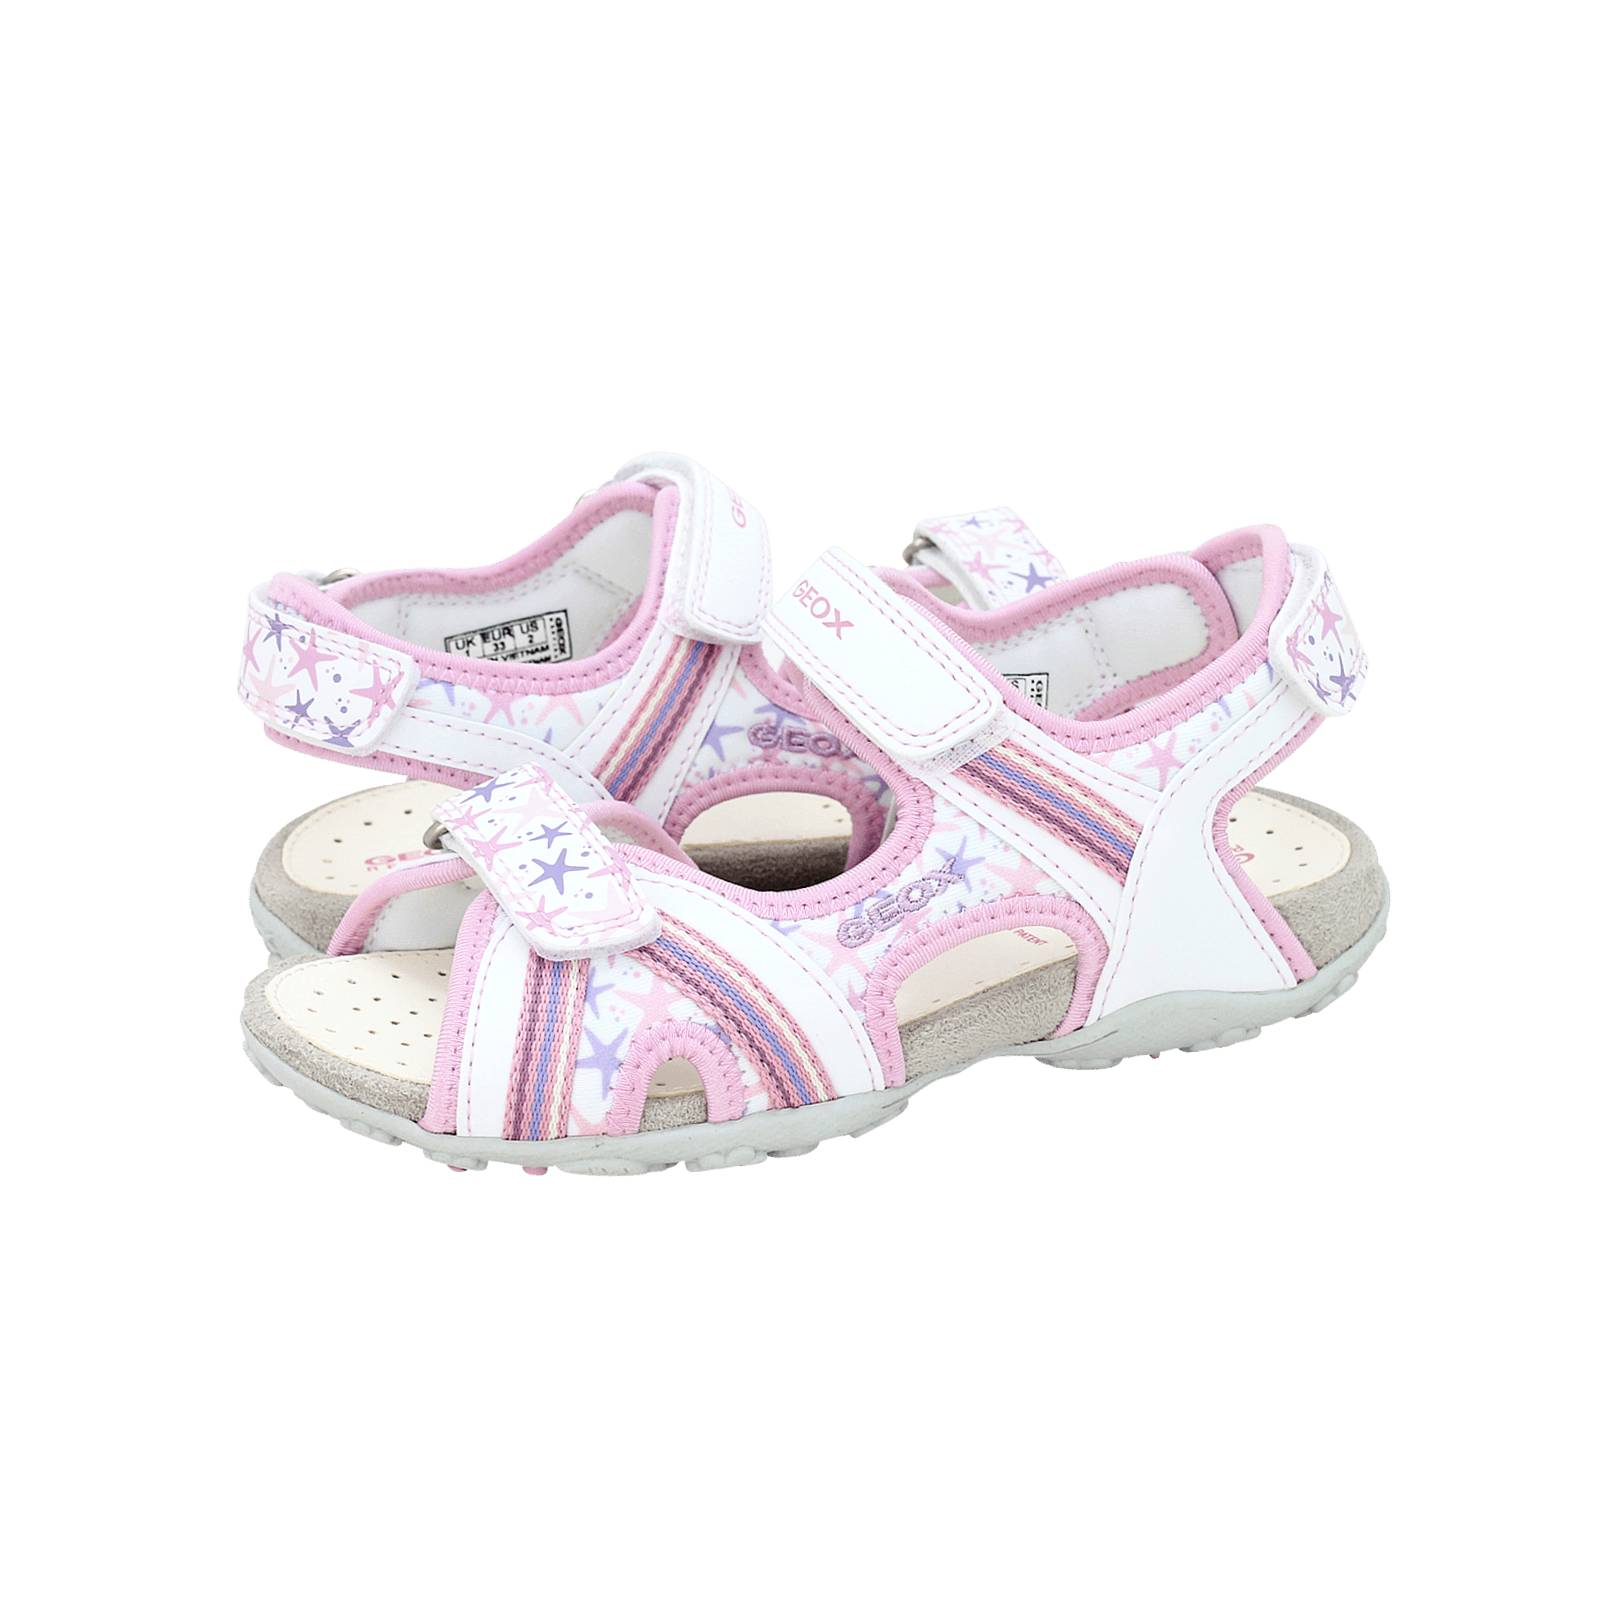 Whitney Fruncir el ceño Registro  J S.Roxanne A - Geox Kids' sandals made of synthetic leather and lycra -  Gianna Kazakou Online